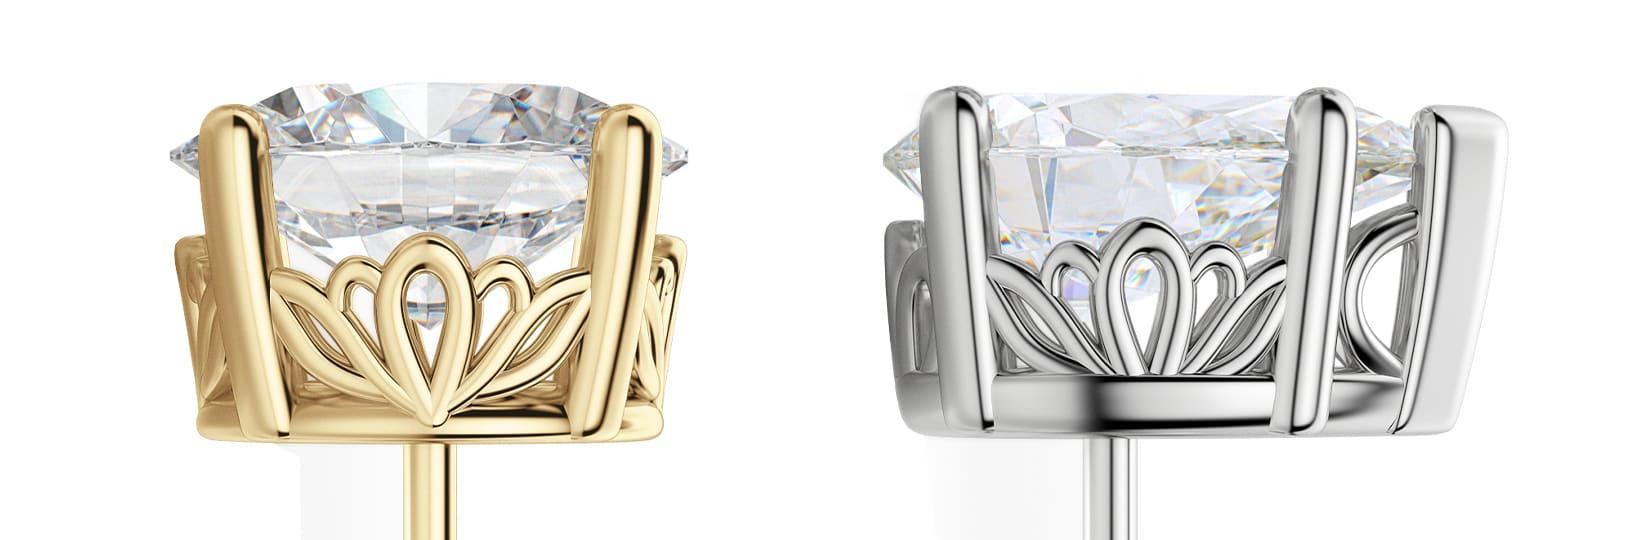 Close-up earring filigree metalwork